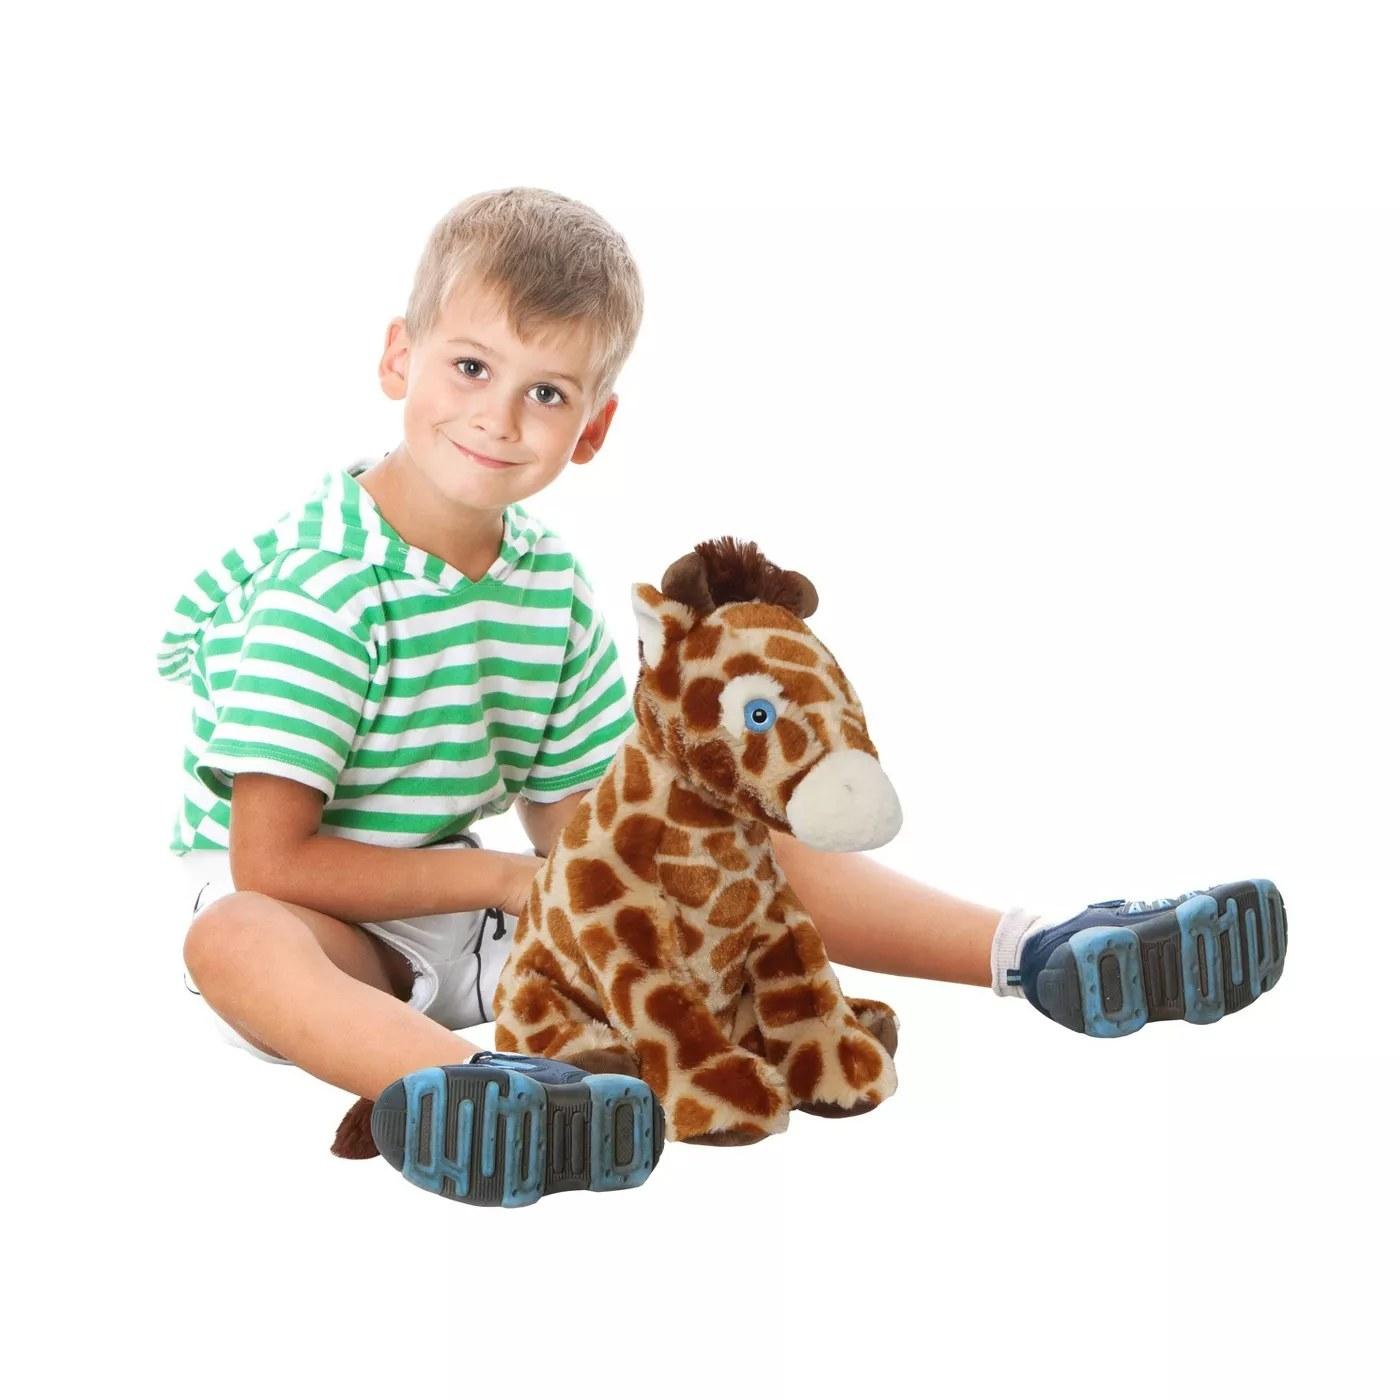 A child with the plush giraffe